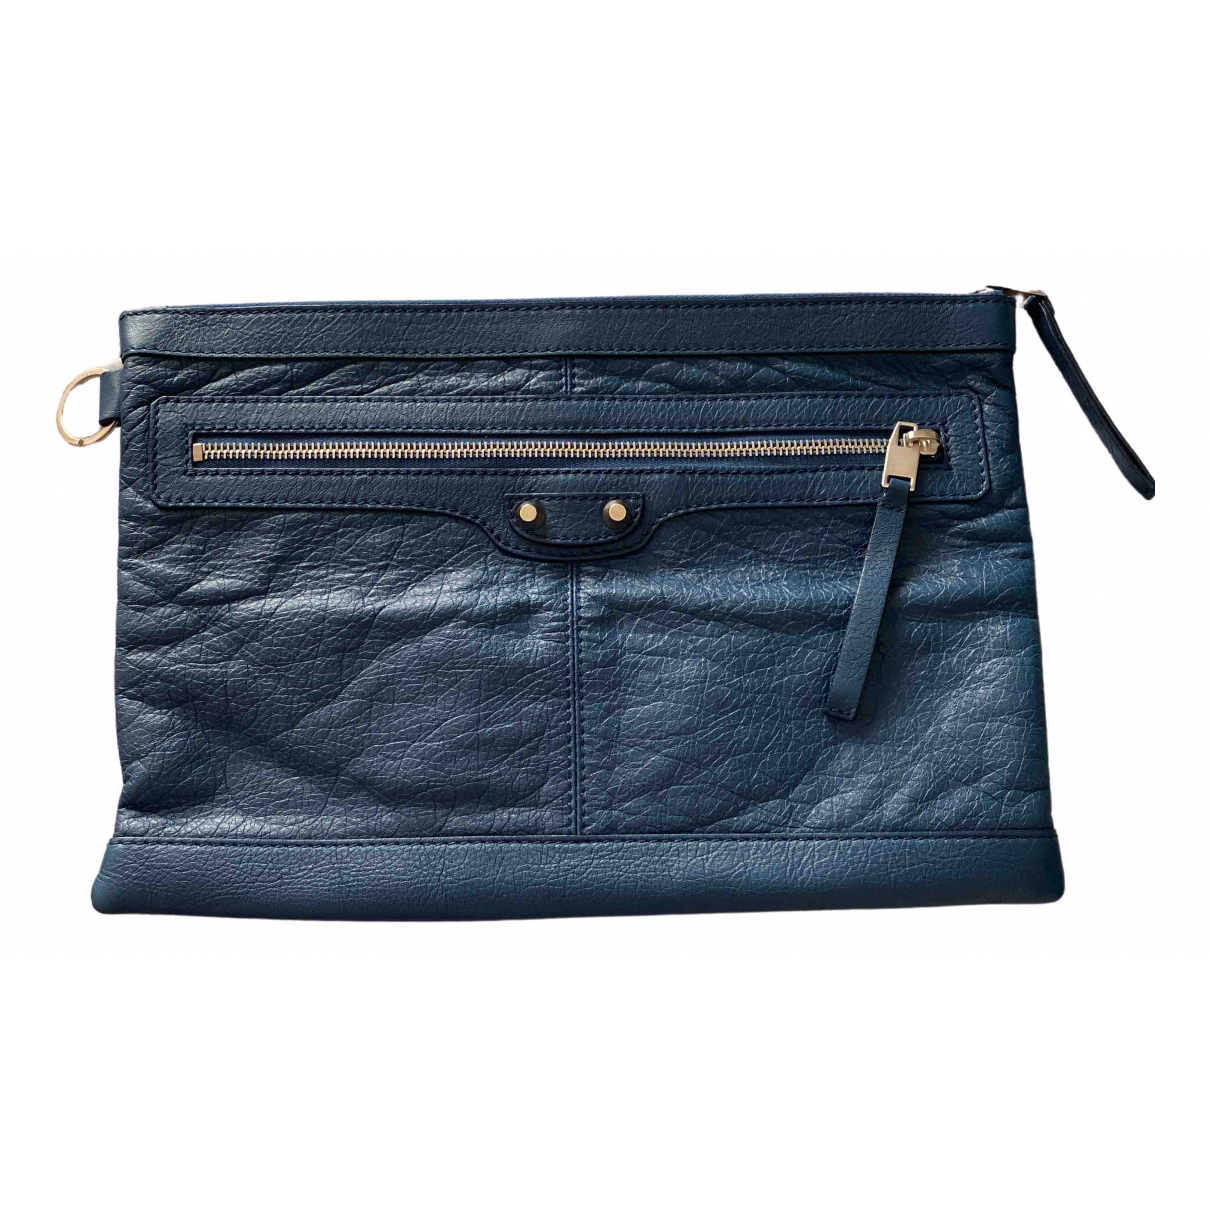 Balenciaga - Pochette   pour femme en cuir - bleu